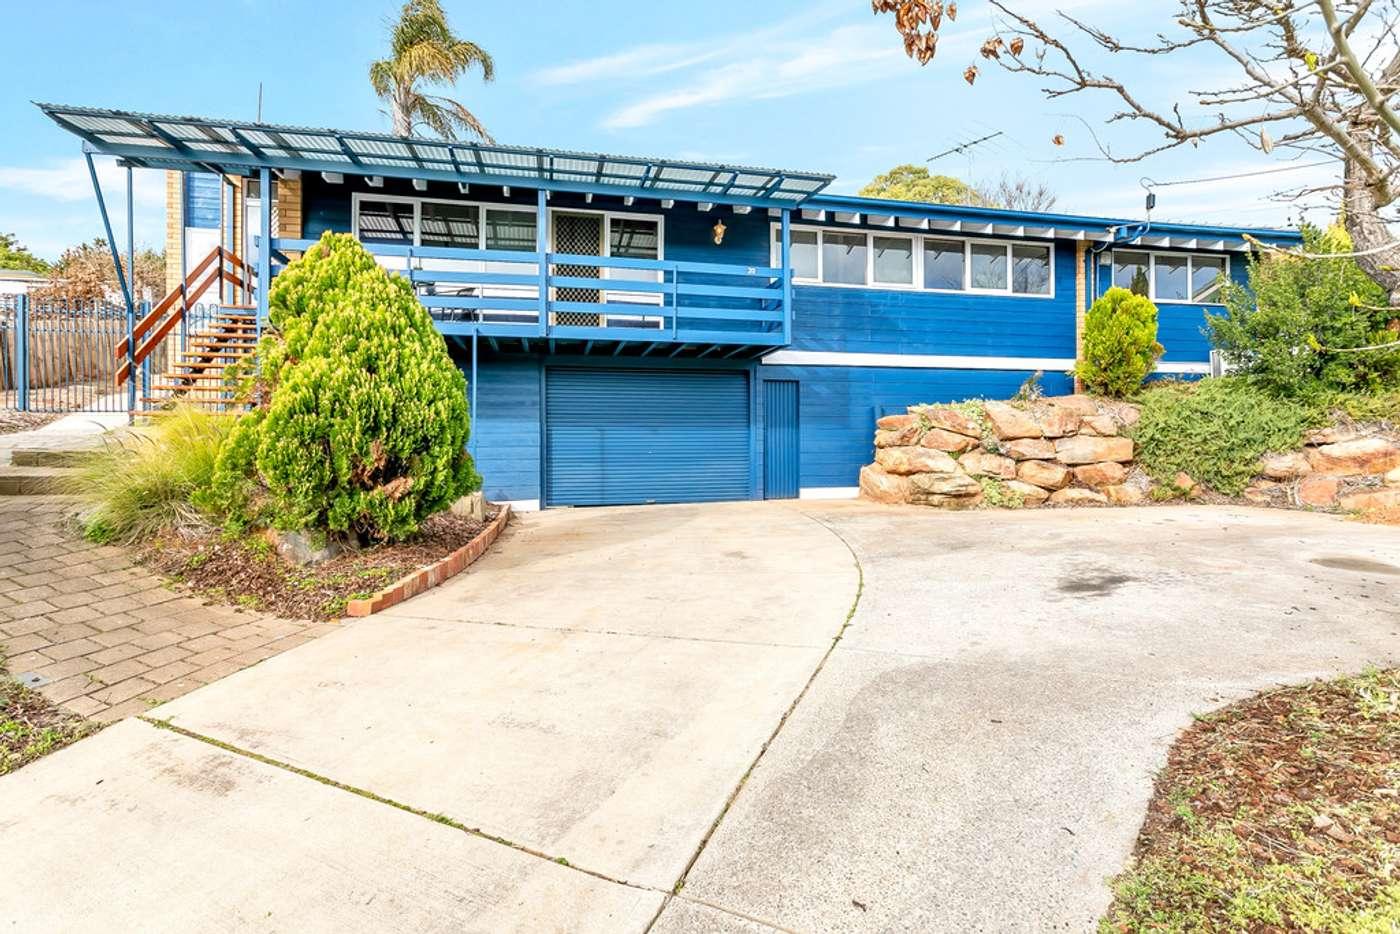 Main view of Homely house listing, 20 Wandilla Street, Seaview Downs SA 5049